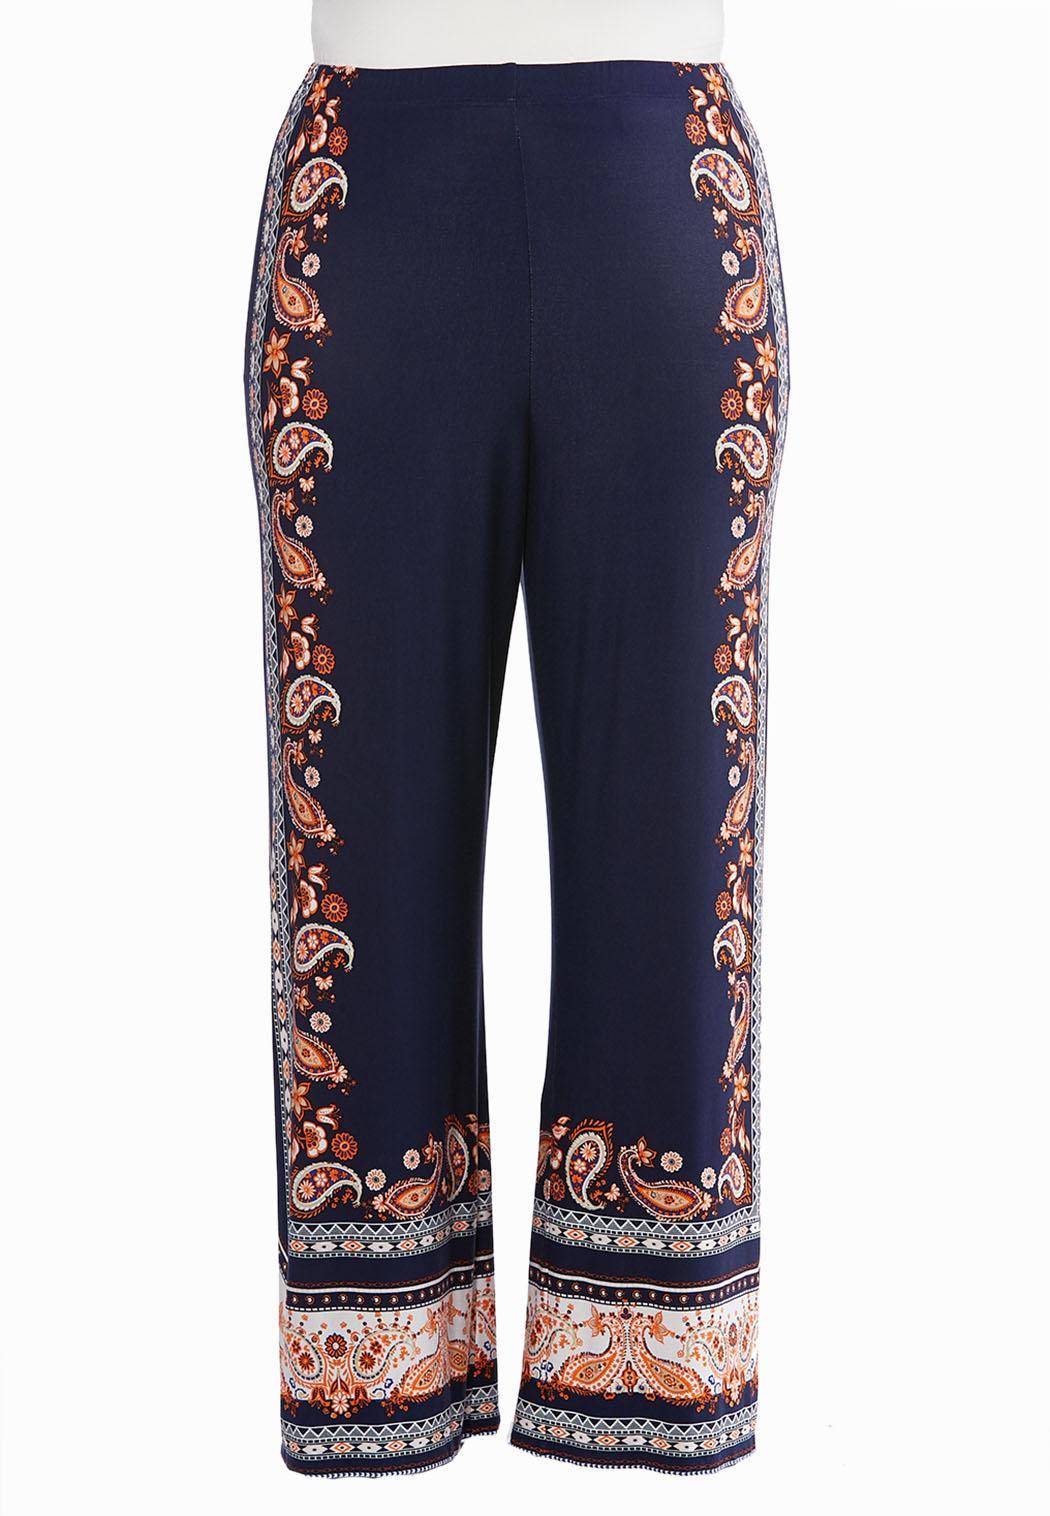 9bb6d29730eb Plus Size Paisley Border Print Palazzo Pants Wide Leg Cato Fashions